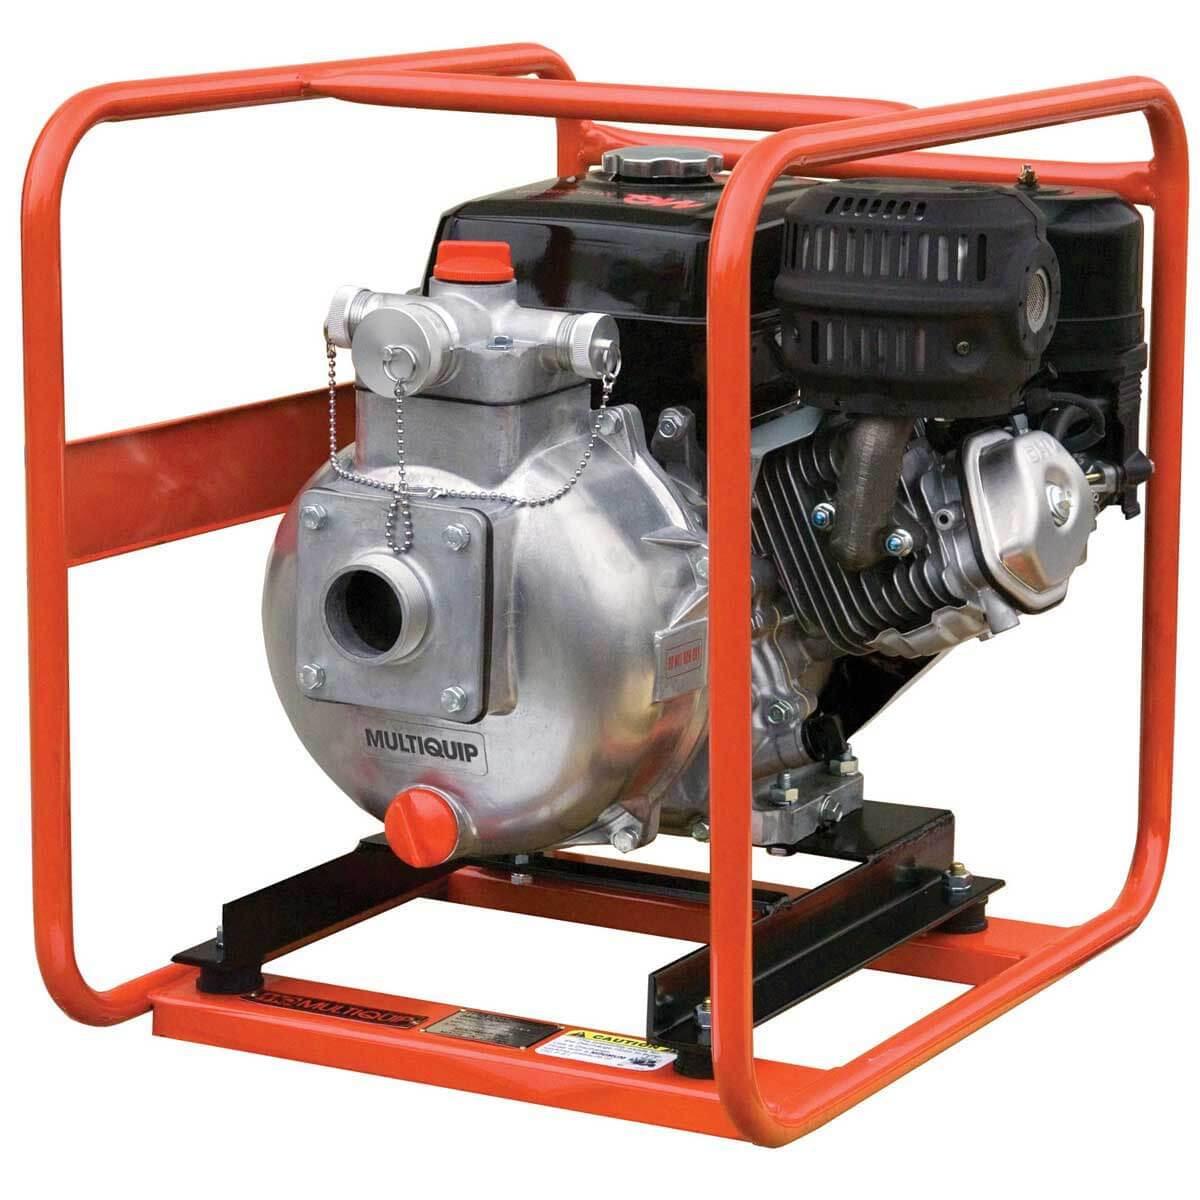 2 inch High Pressure Centrifugal Dewatering Pump QP205SH Multiquip